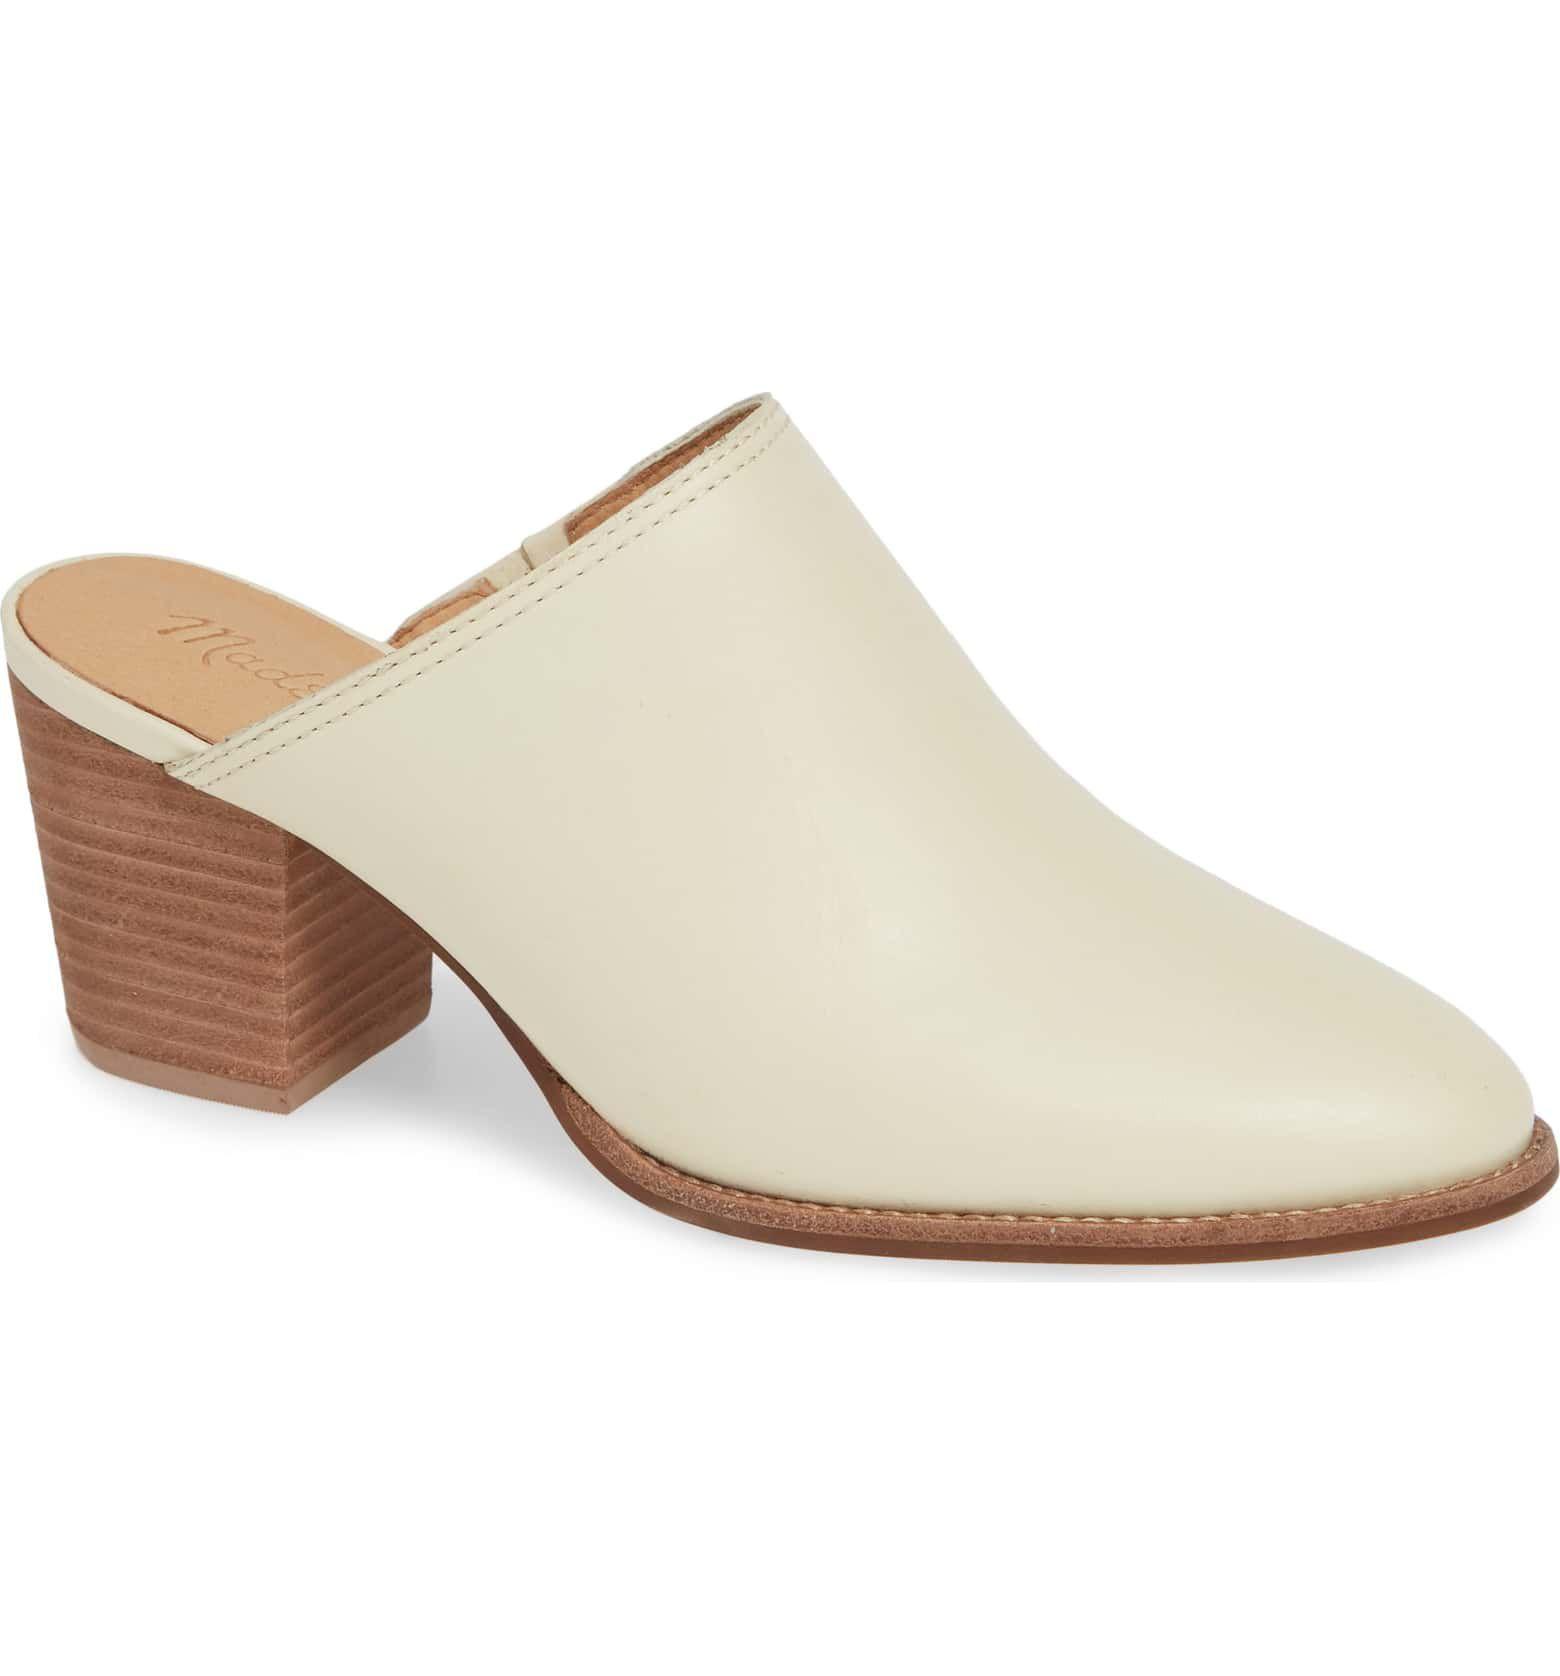 5978e5885e6 15 Most Comfortable High Heels - Comfy High Heeled Shoes for Women